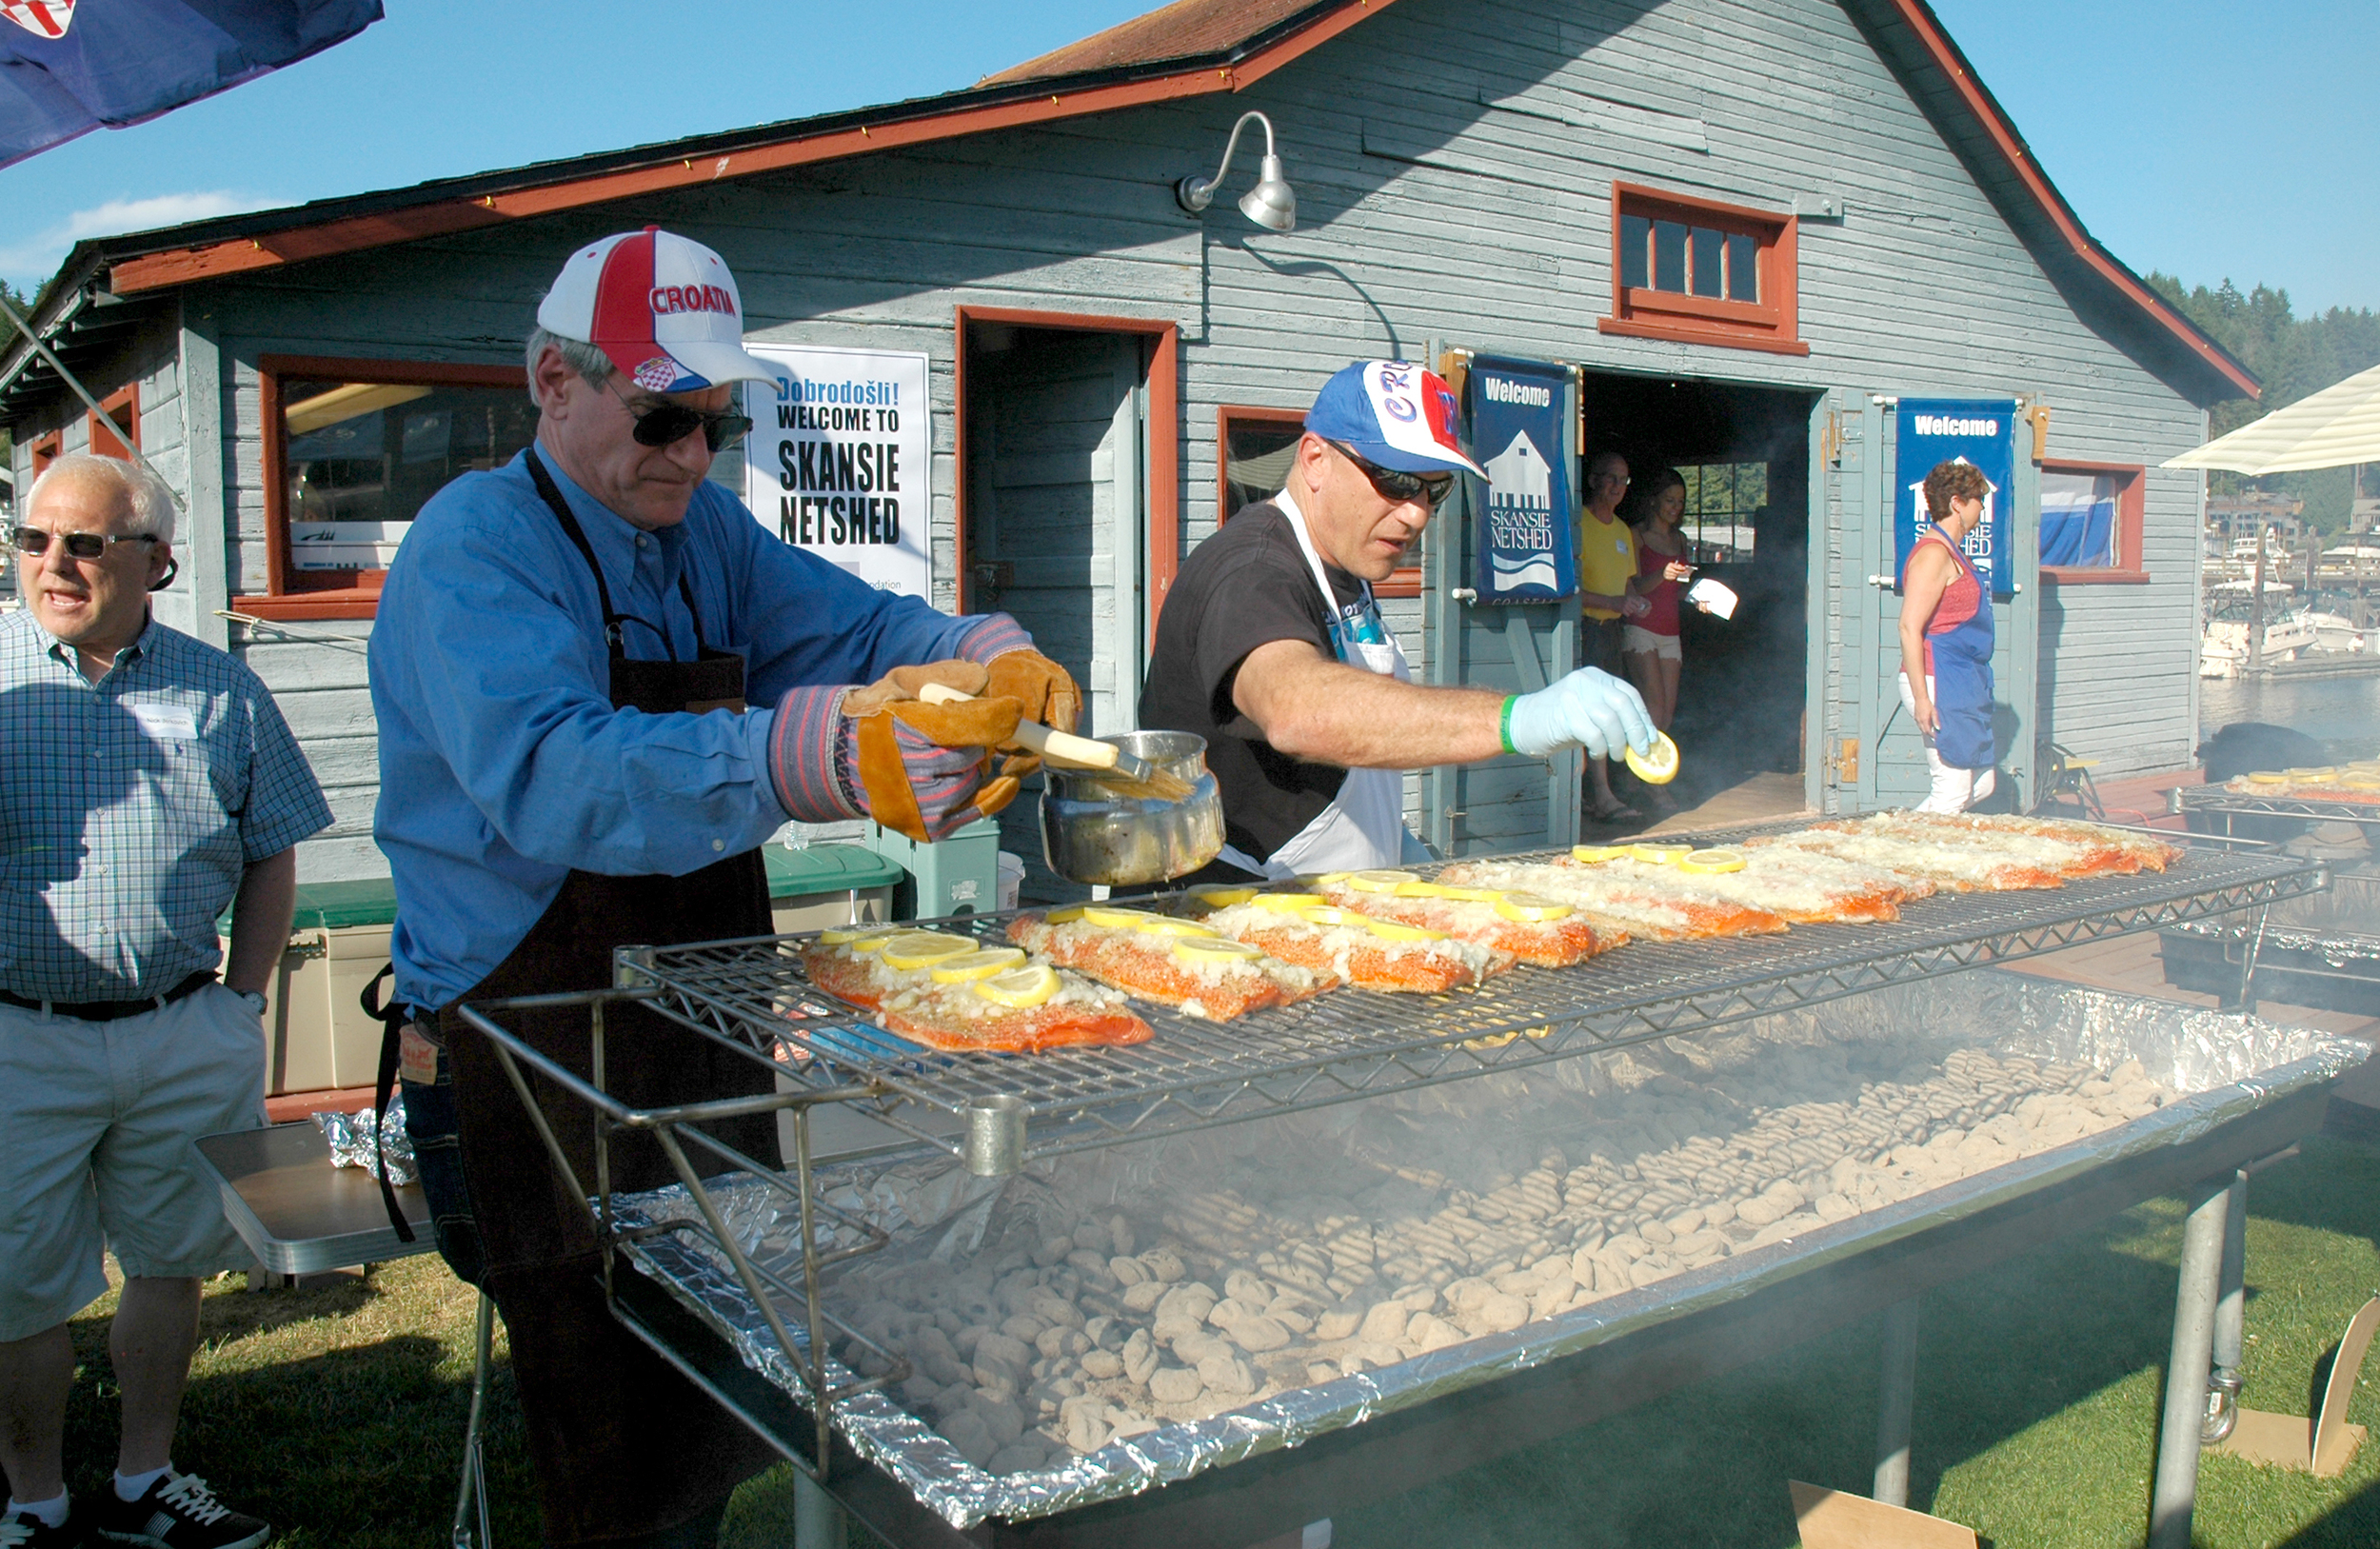 Chefs David Lovrovich and John Skansie prepared the meal.